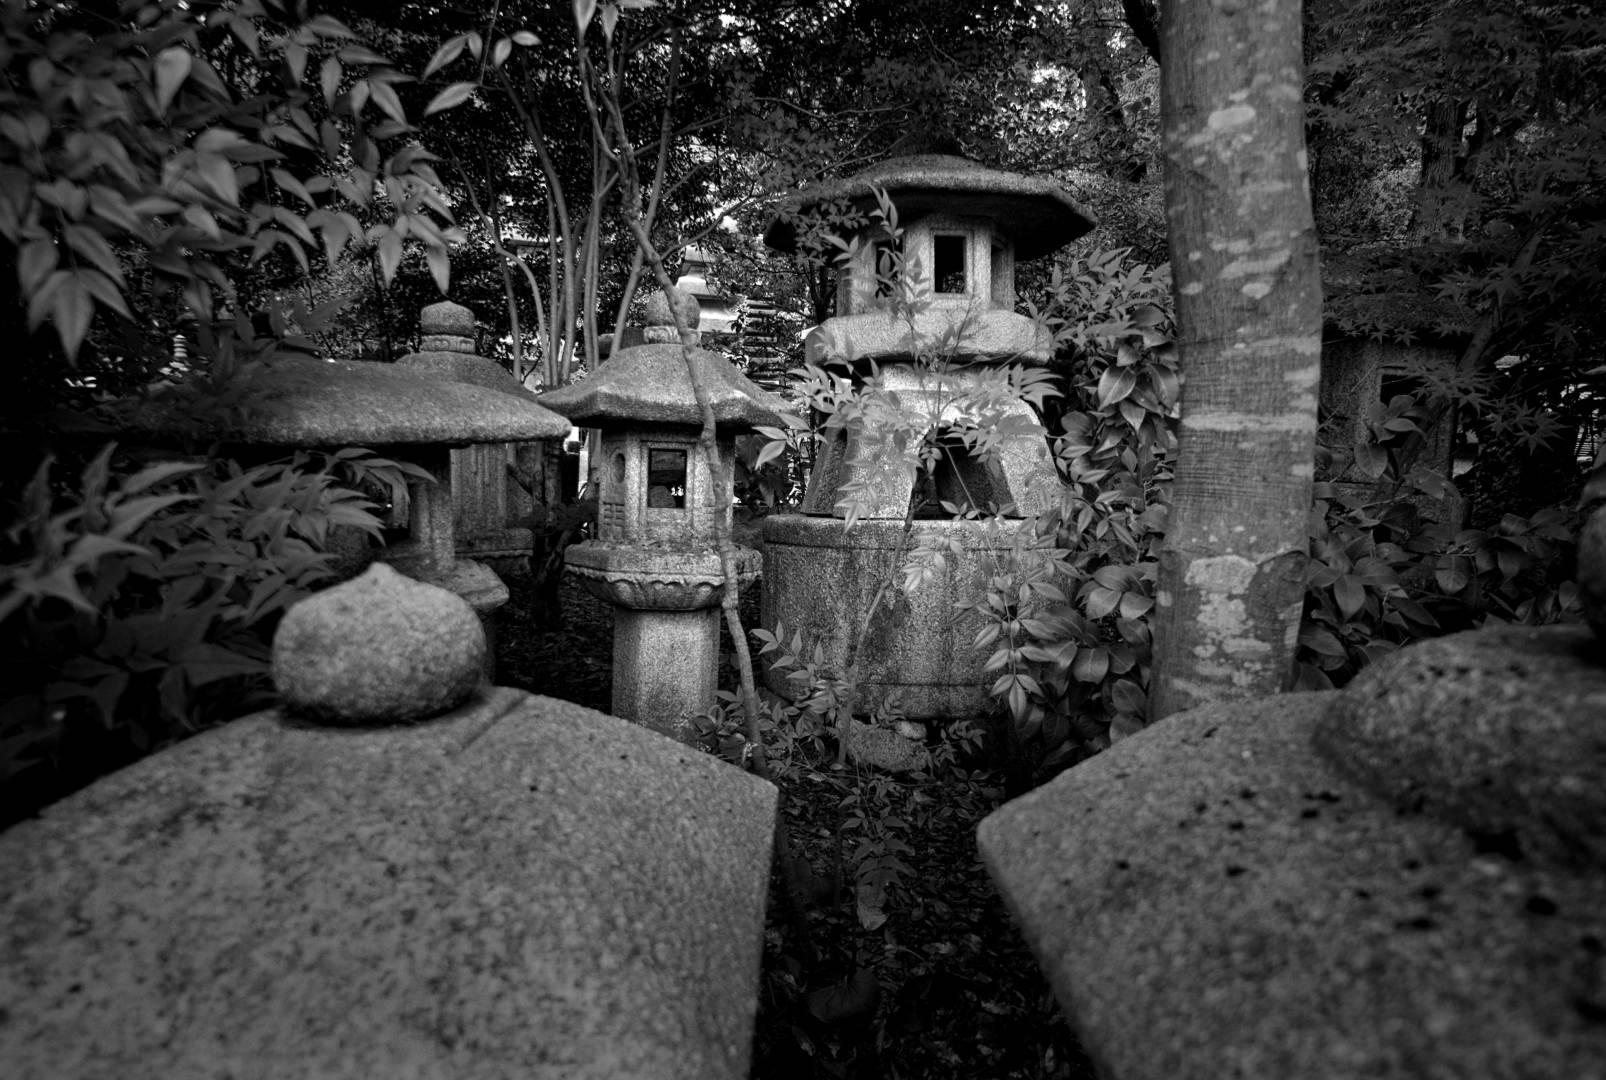 Stone lantern storage Ryoan-ji temple, Leica M8 50mm Summicron